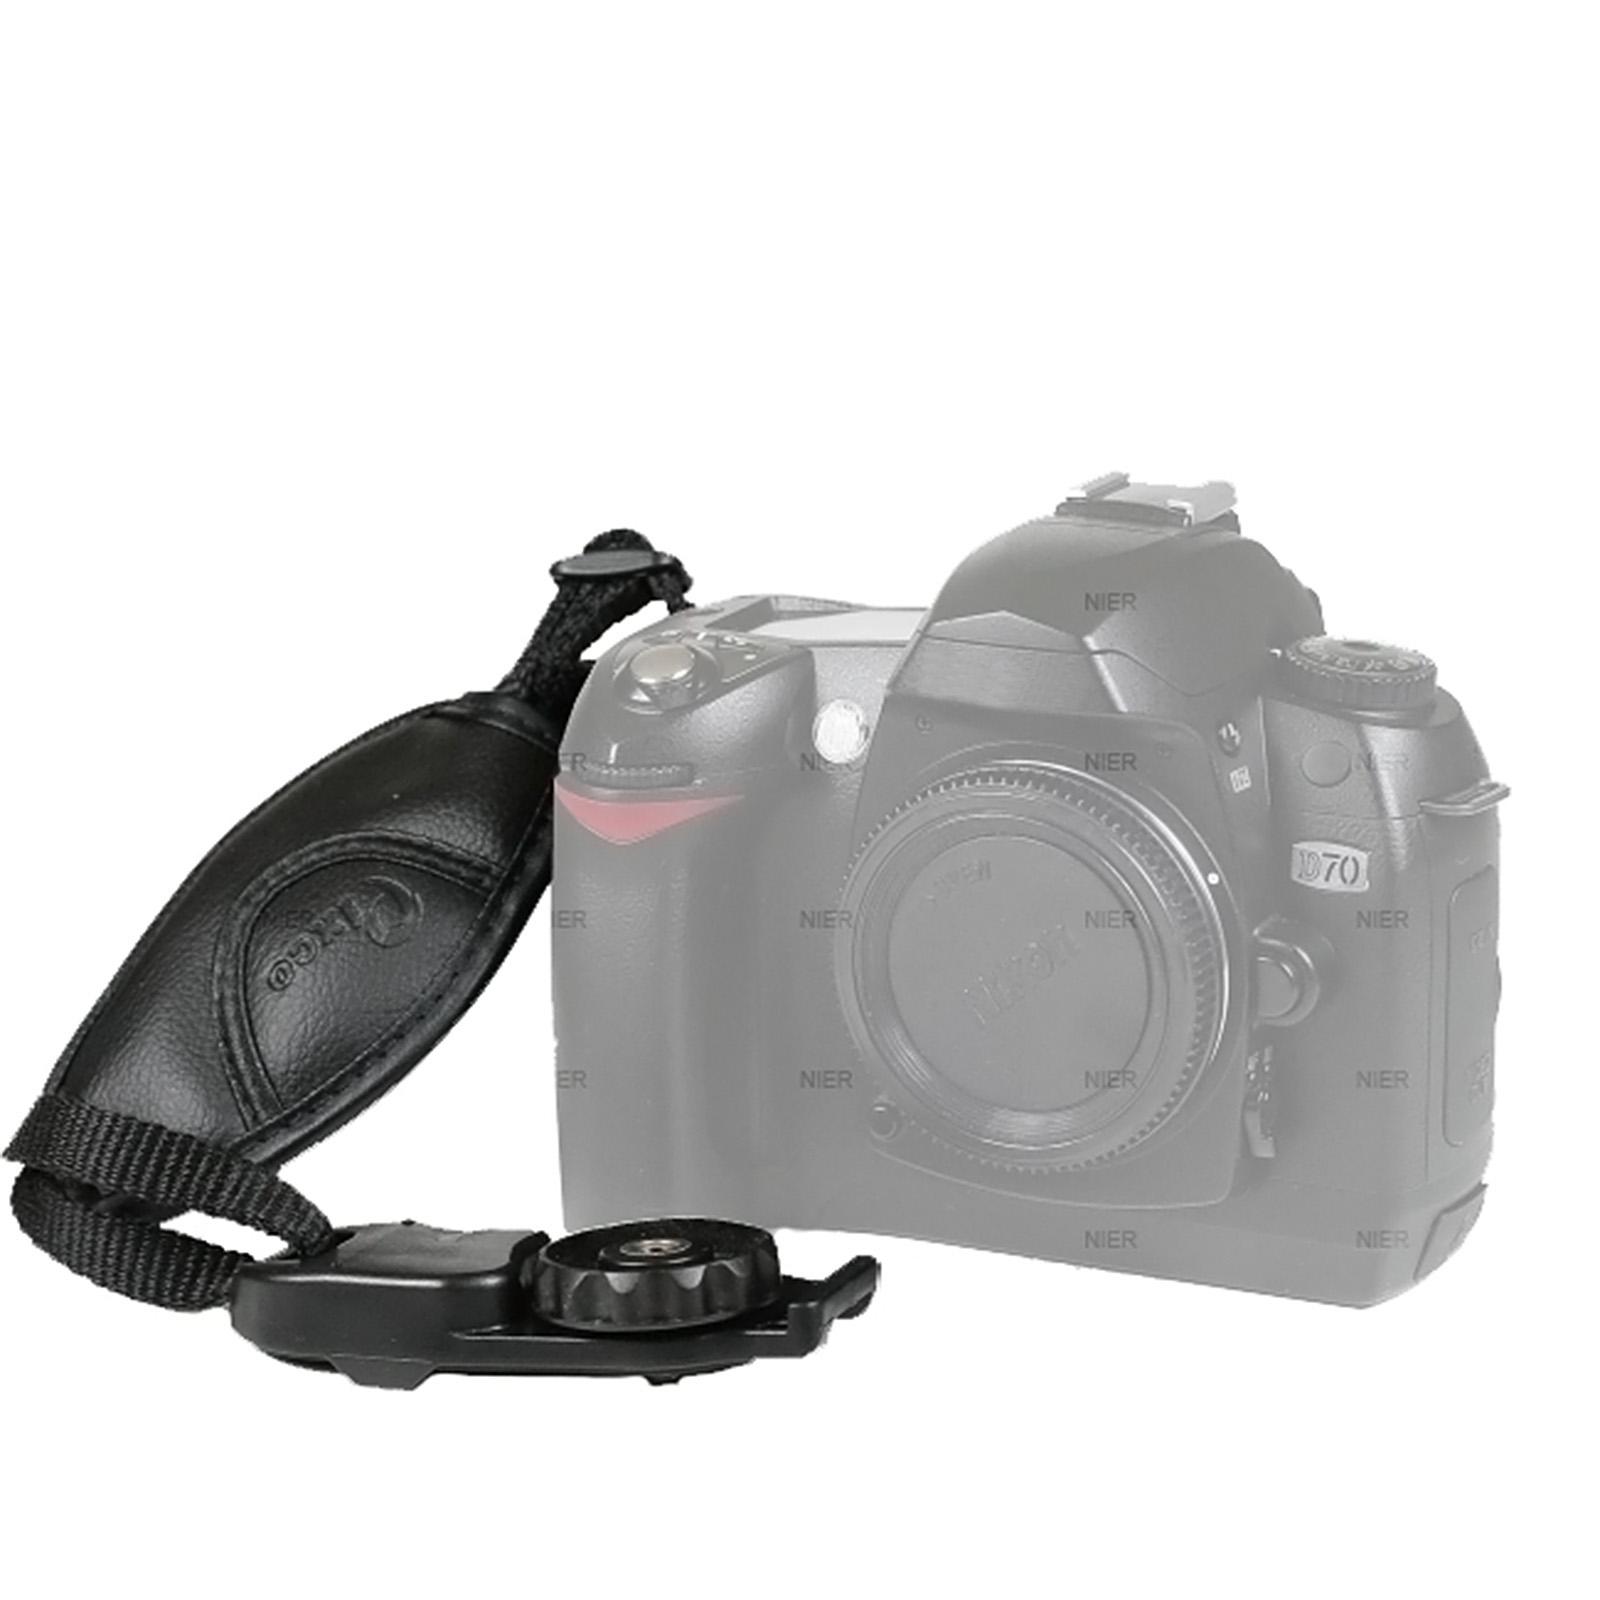 Detalles de Handschlaufe Leder für Canon EOS 1000D 700D 650D 600D ...